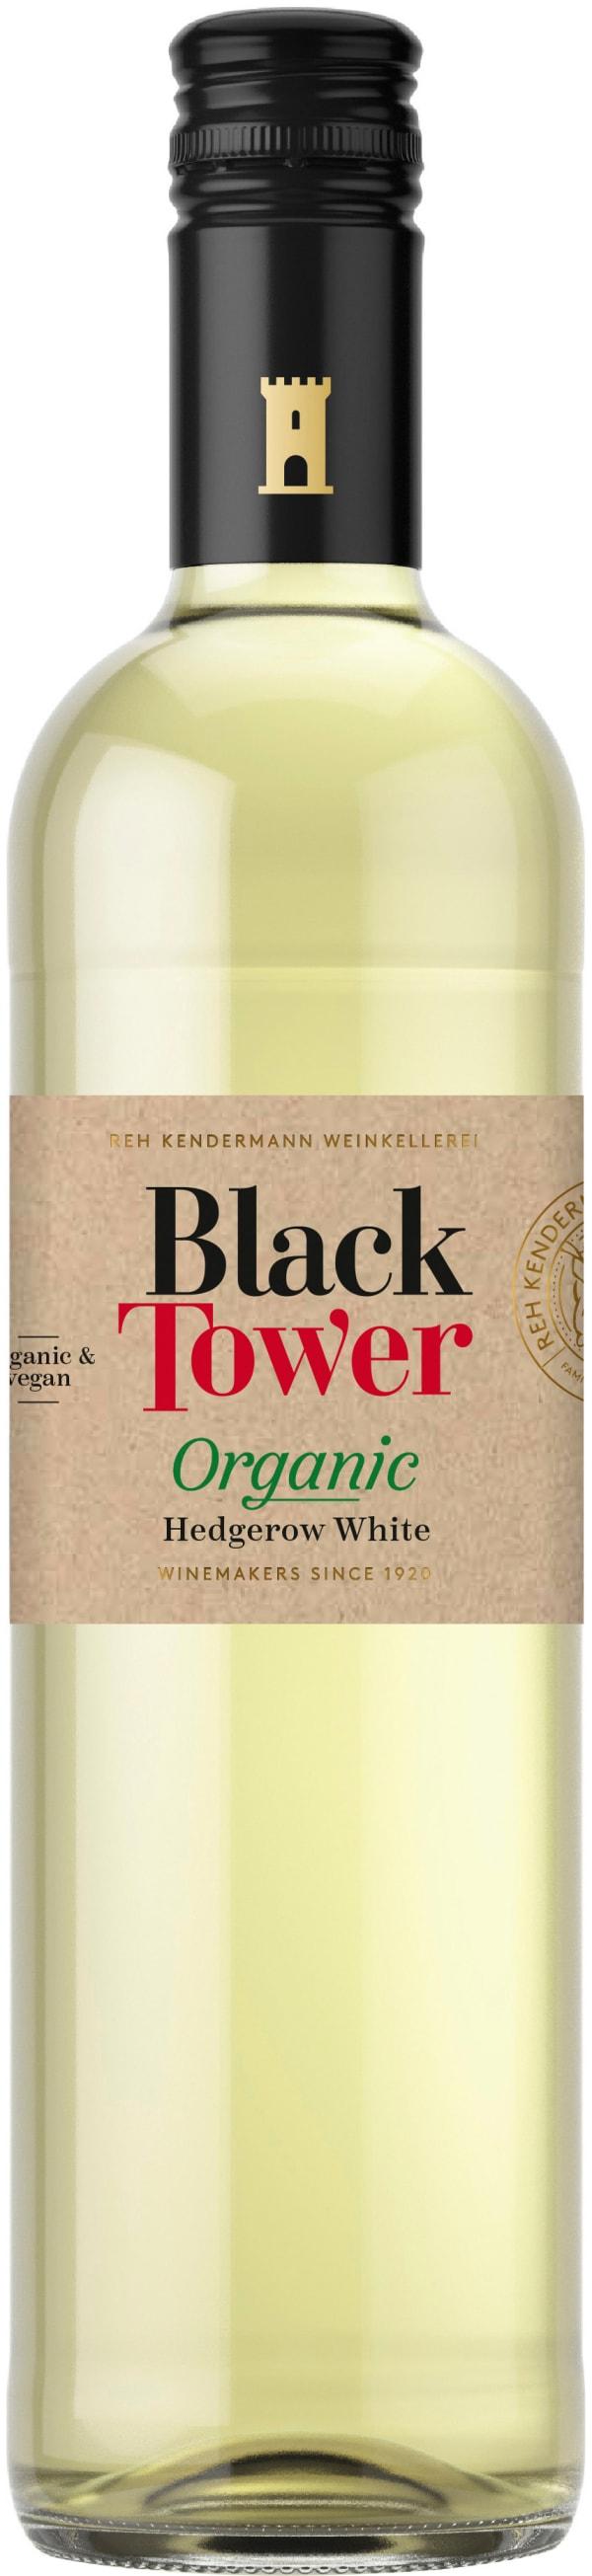 Black Tower Hedgerow Organic 2019